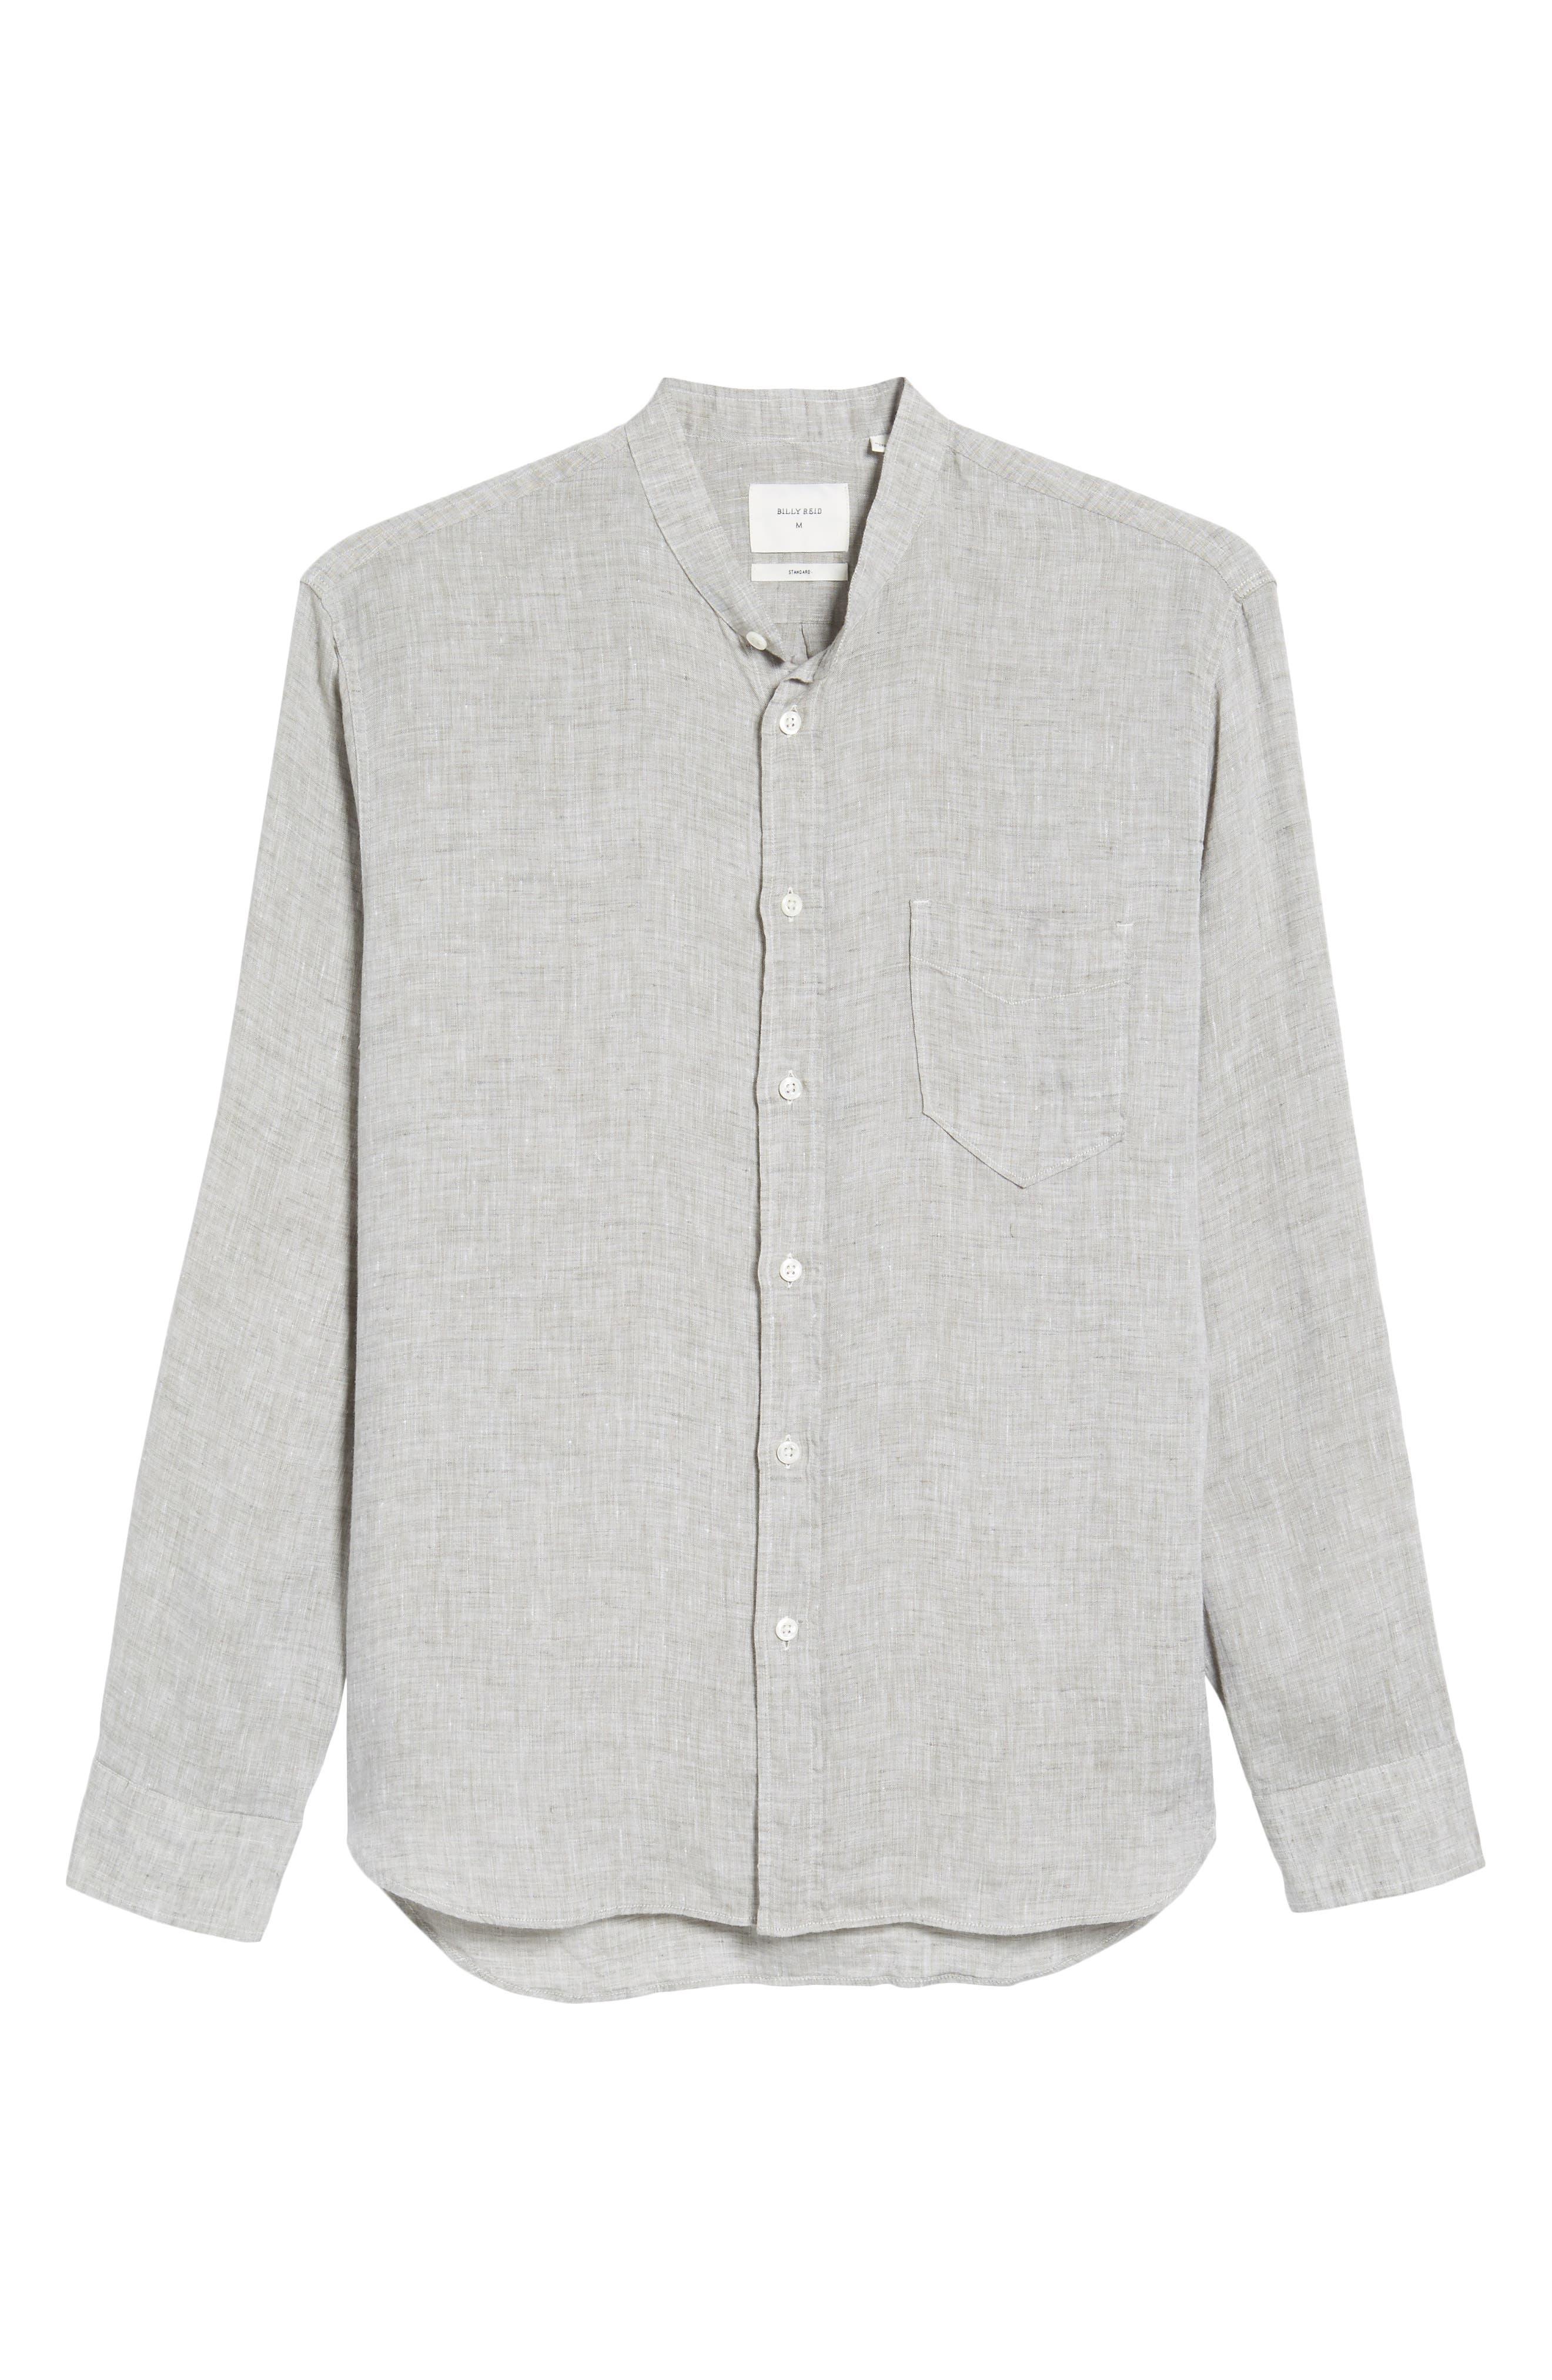 Crawford Sport Shirt,                             Alternate thumbnail 6, color,                             Grey